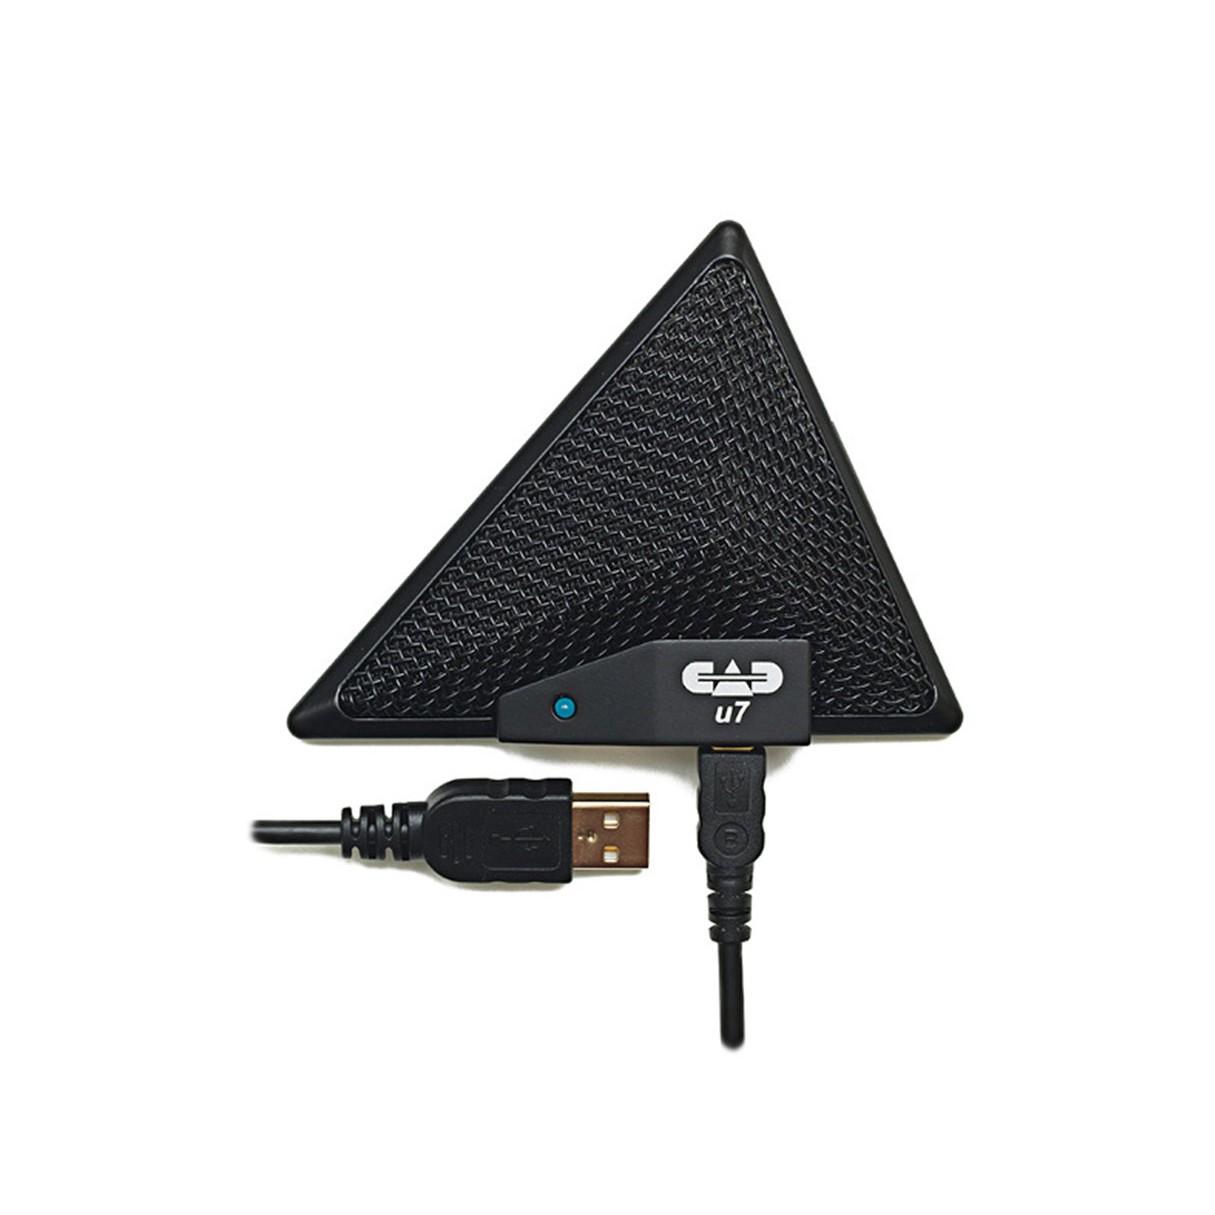 cad u7 usb boundary omnidirectional condenser microphone 10 usb cable. Black Bedroom Furniture Sets. Home Design Ideas